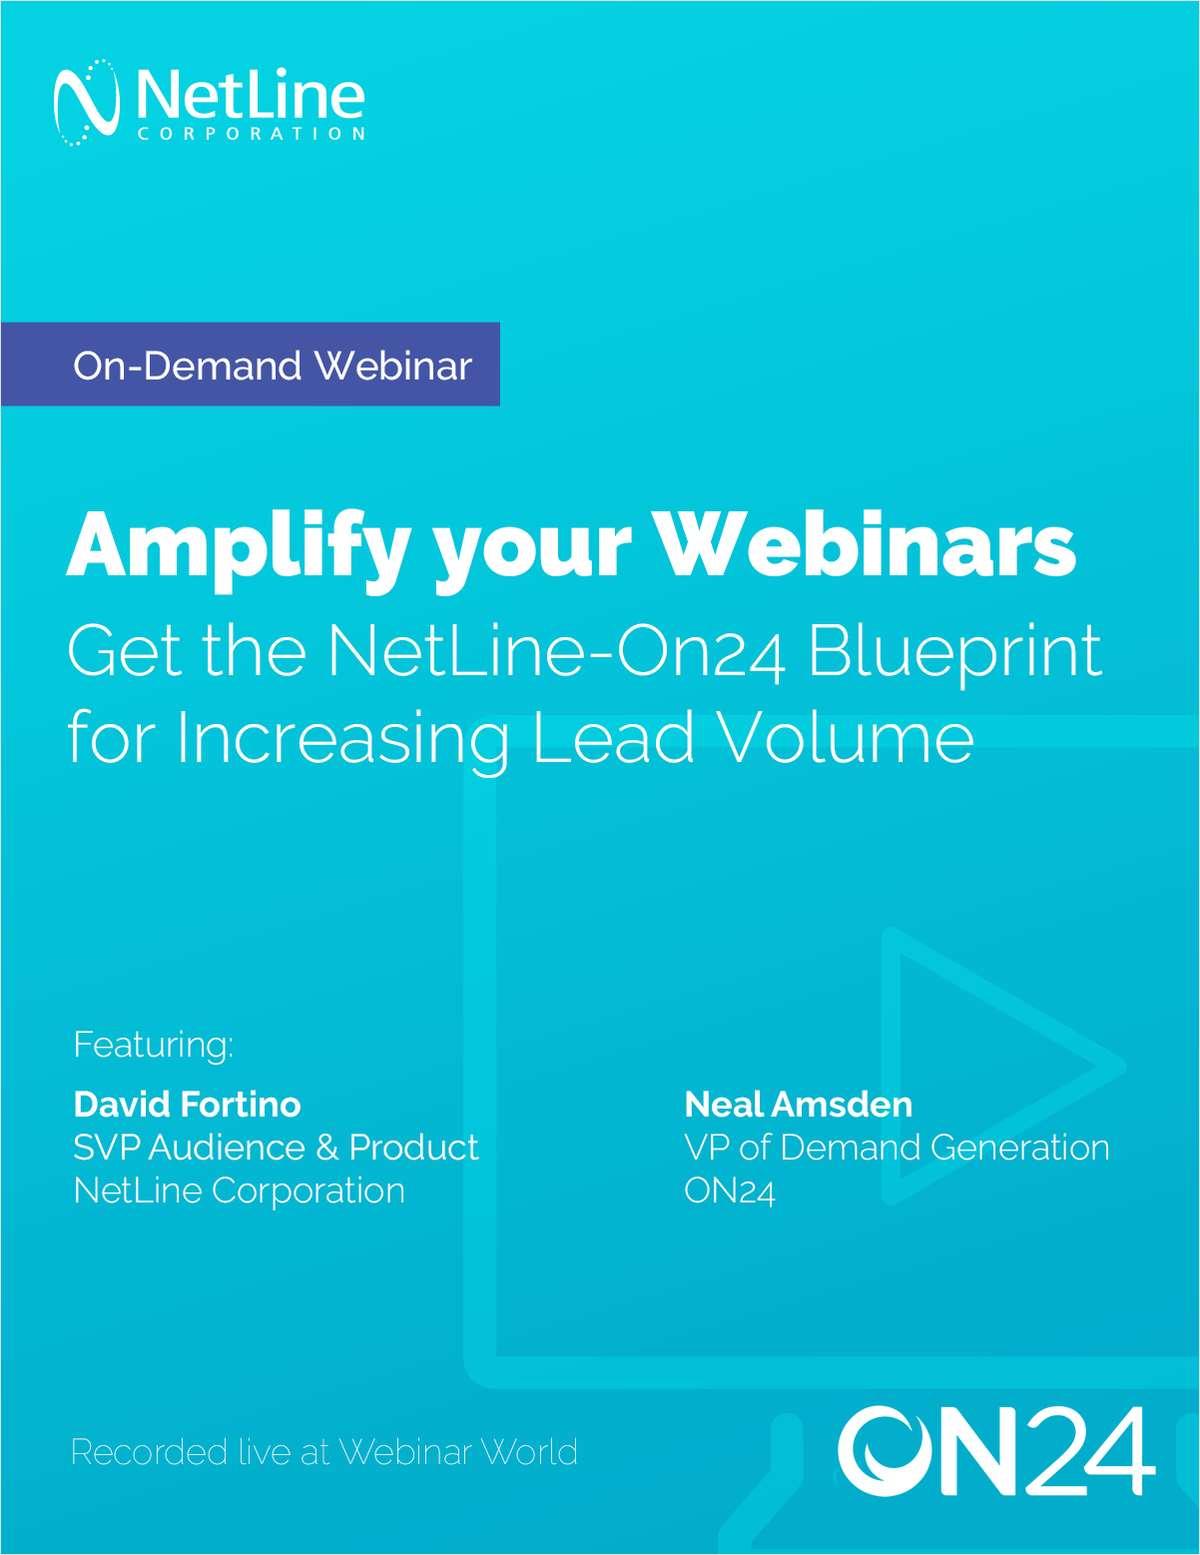 Amplify your Webinars: Get the NetLine-ON24 Blueprint for Increasing Lead Volume